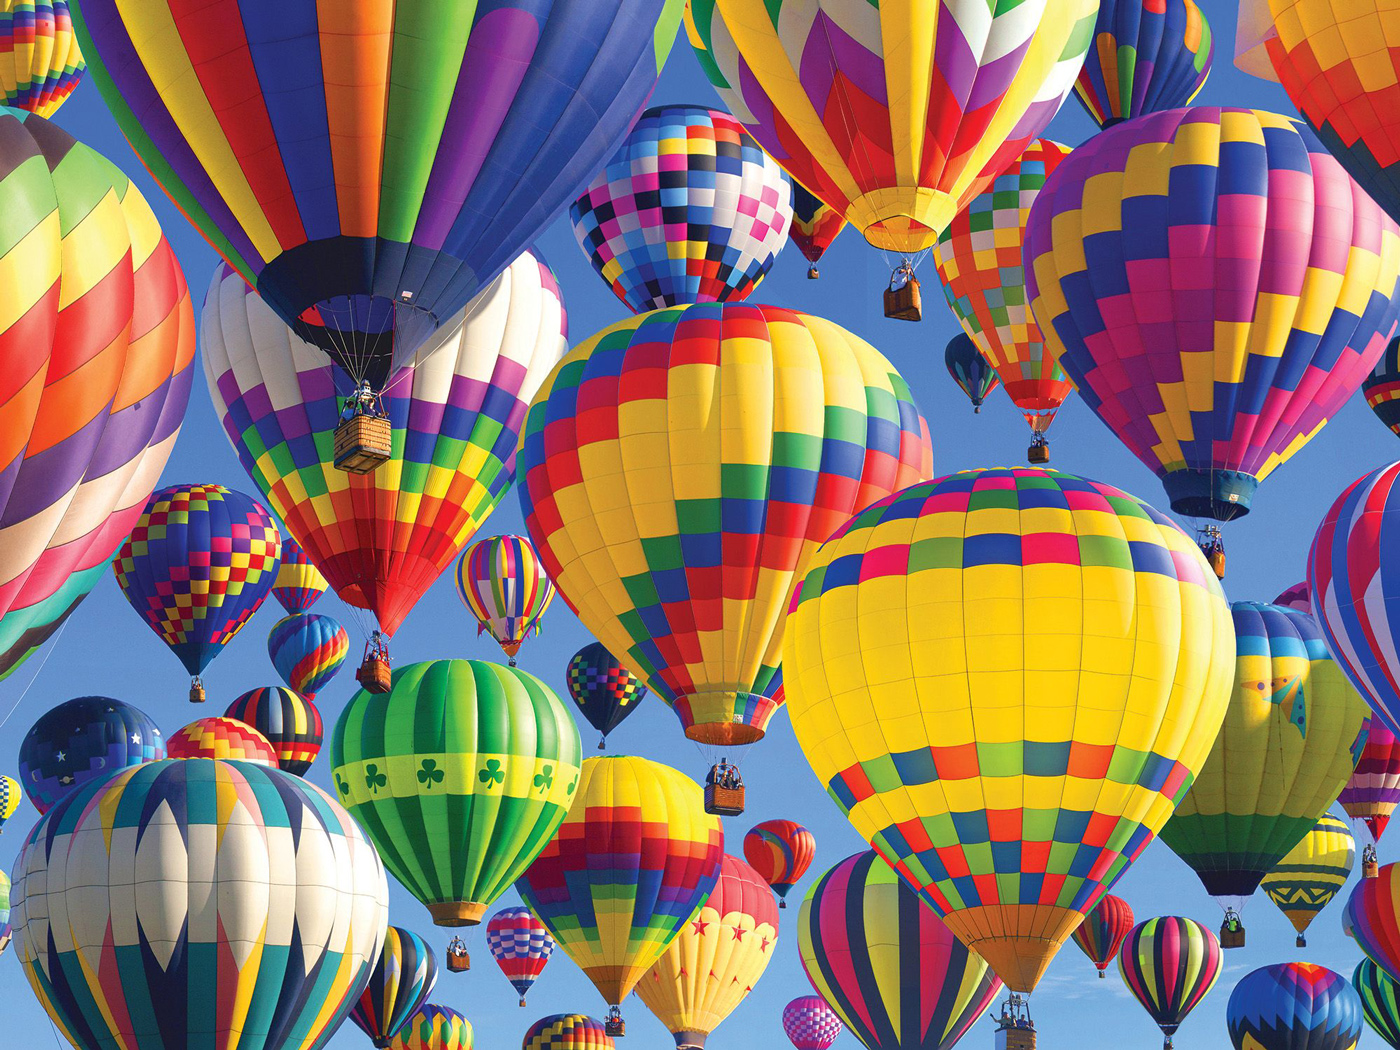 Balloon Ride Balloons Jigsaw Puzzle